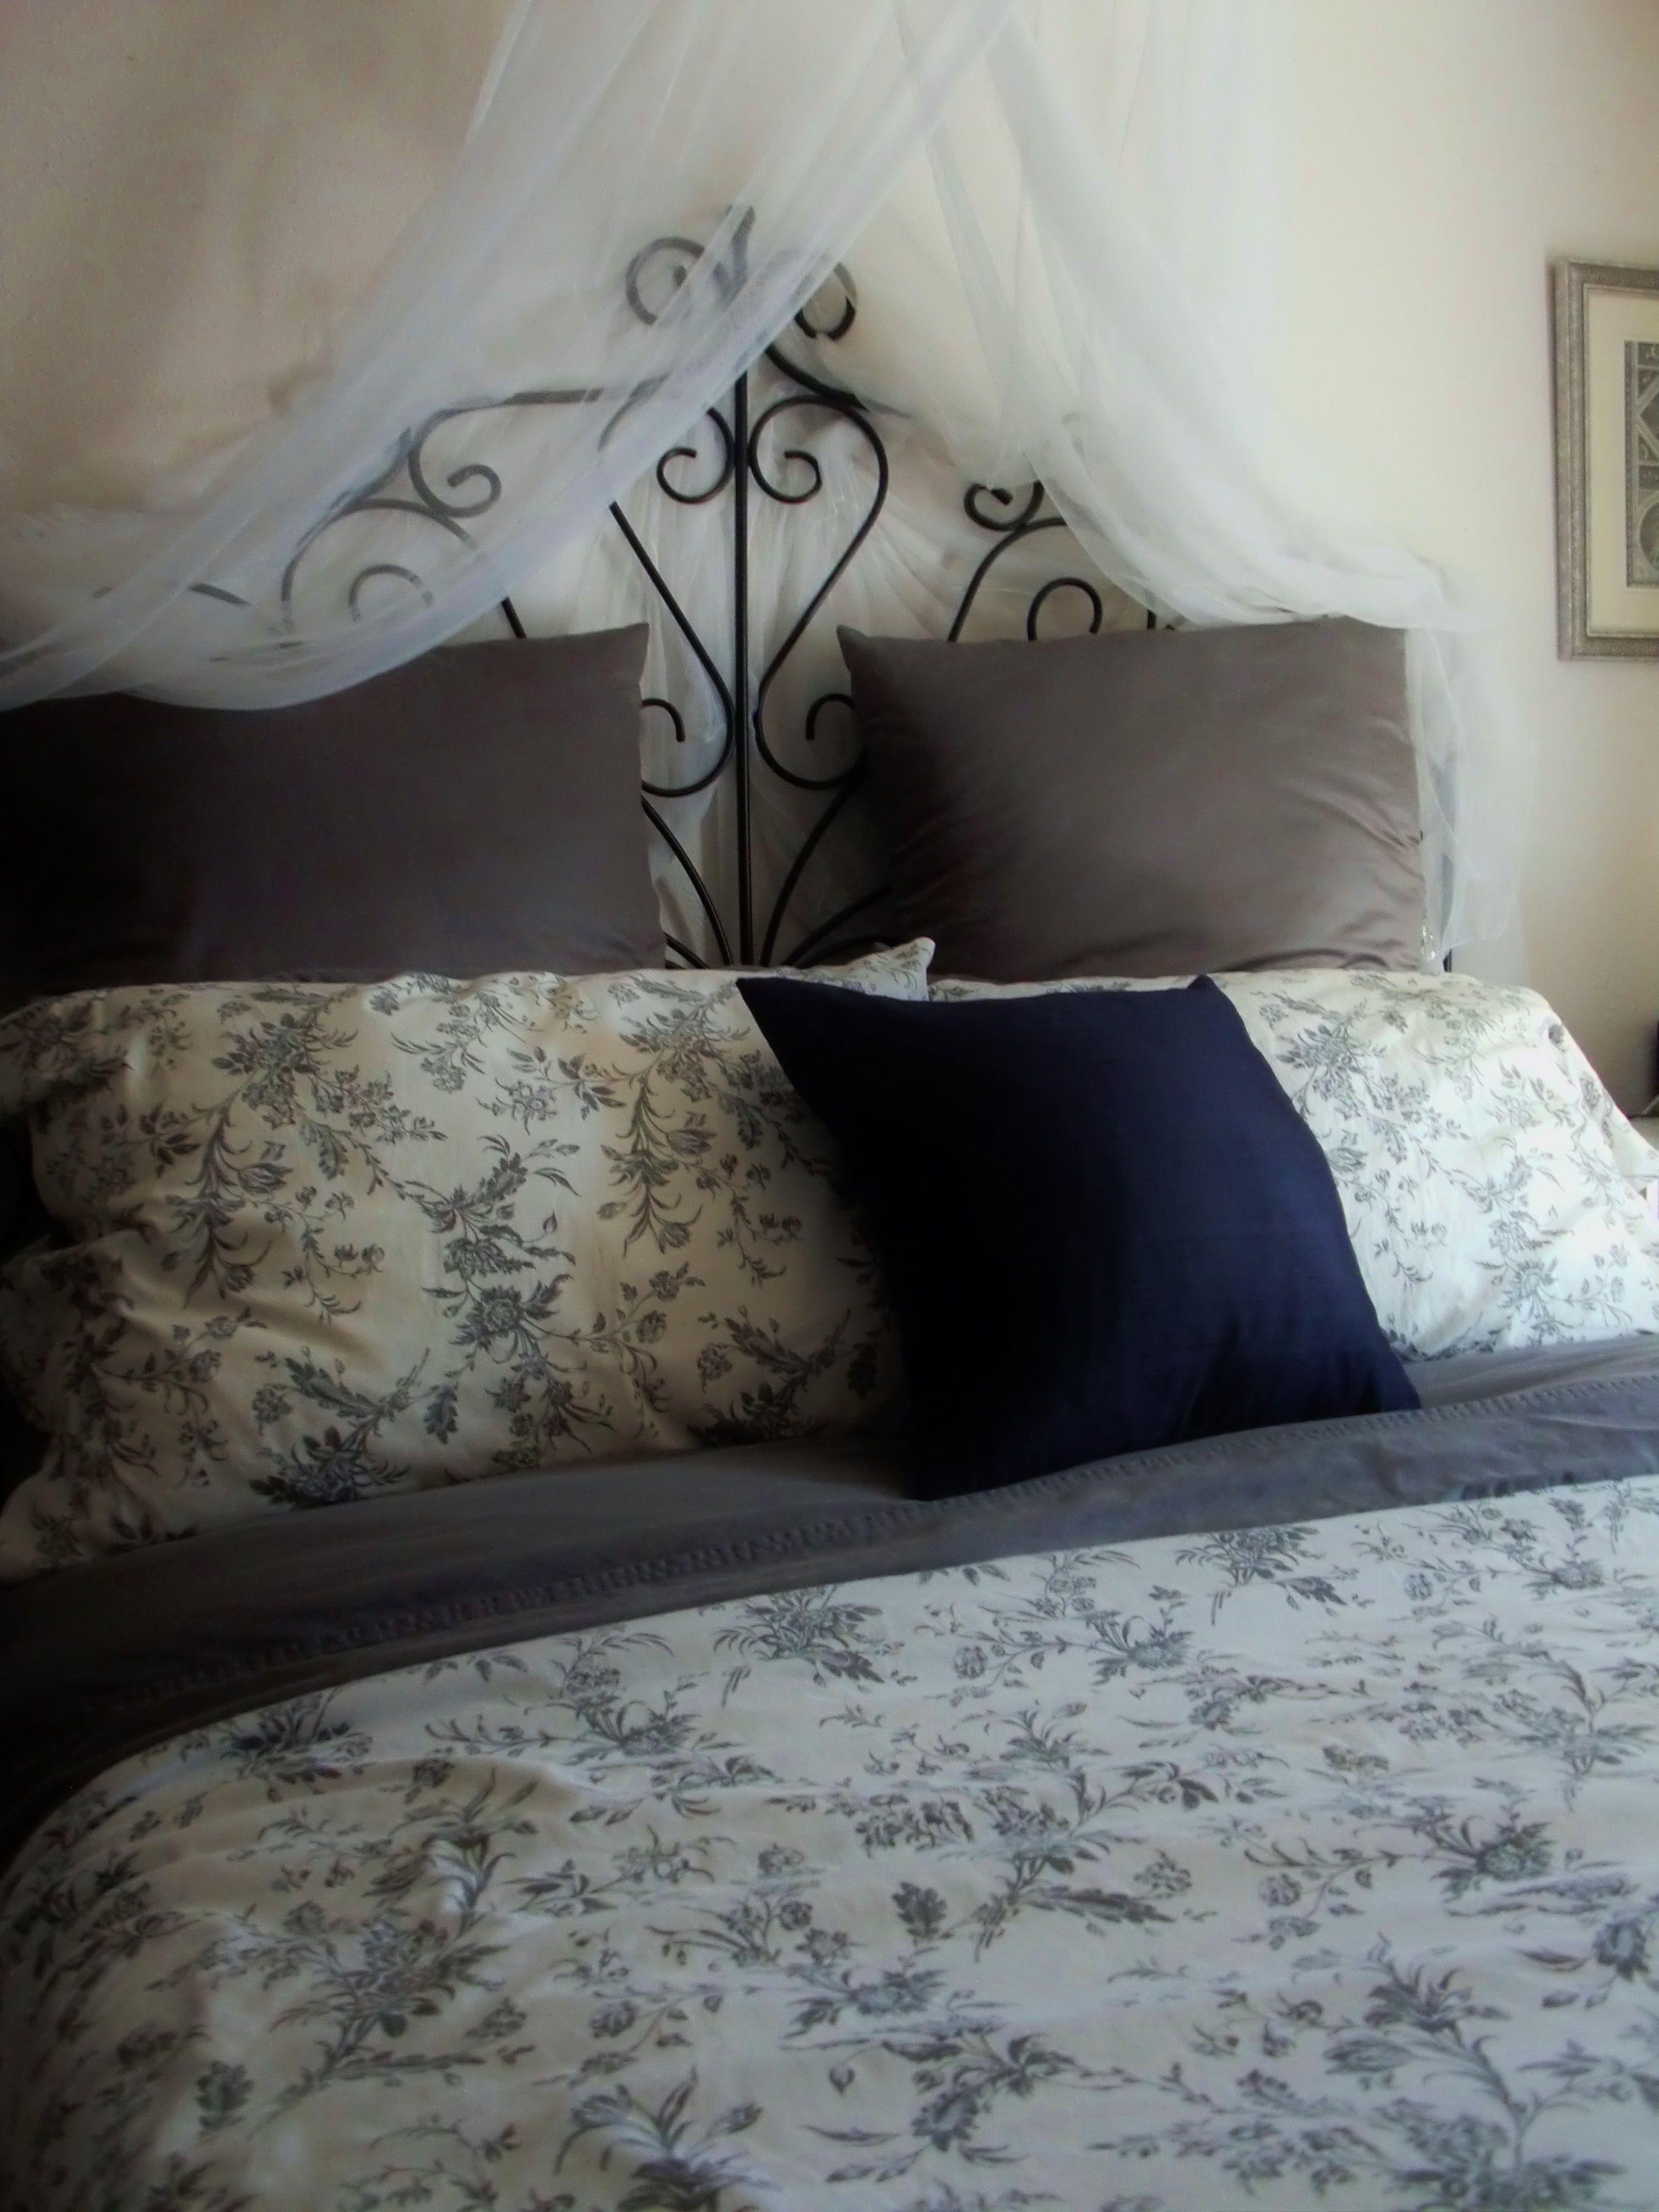 Ikea Manger Iron Headboard Iron Headboard Bed Pillows